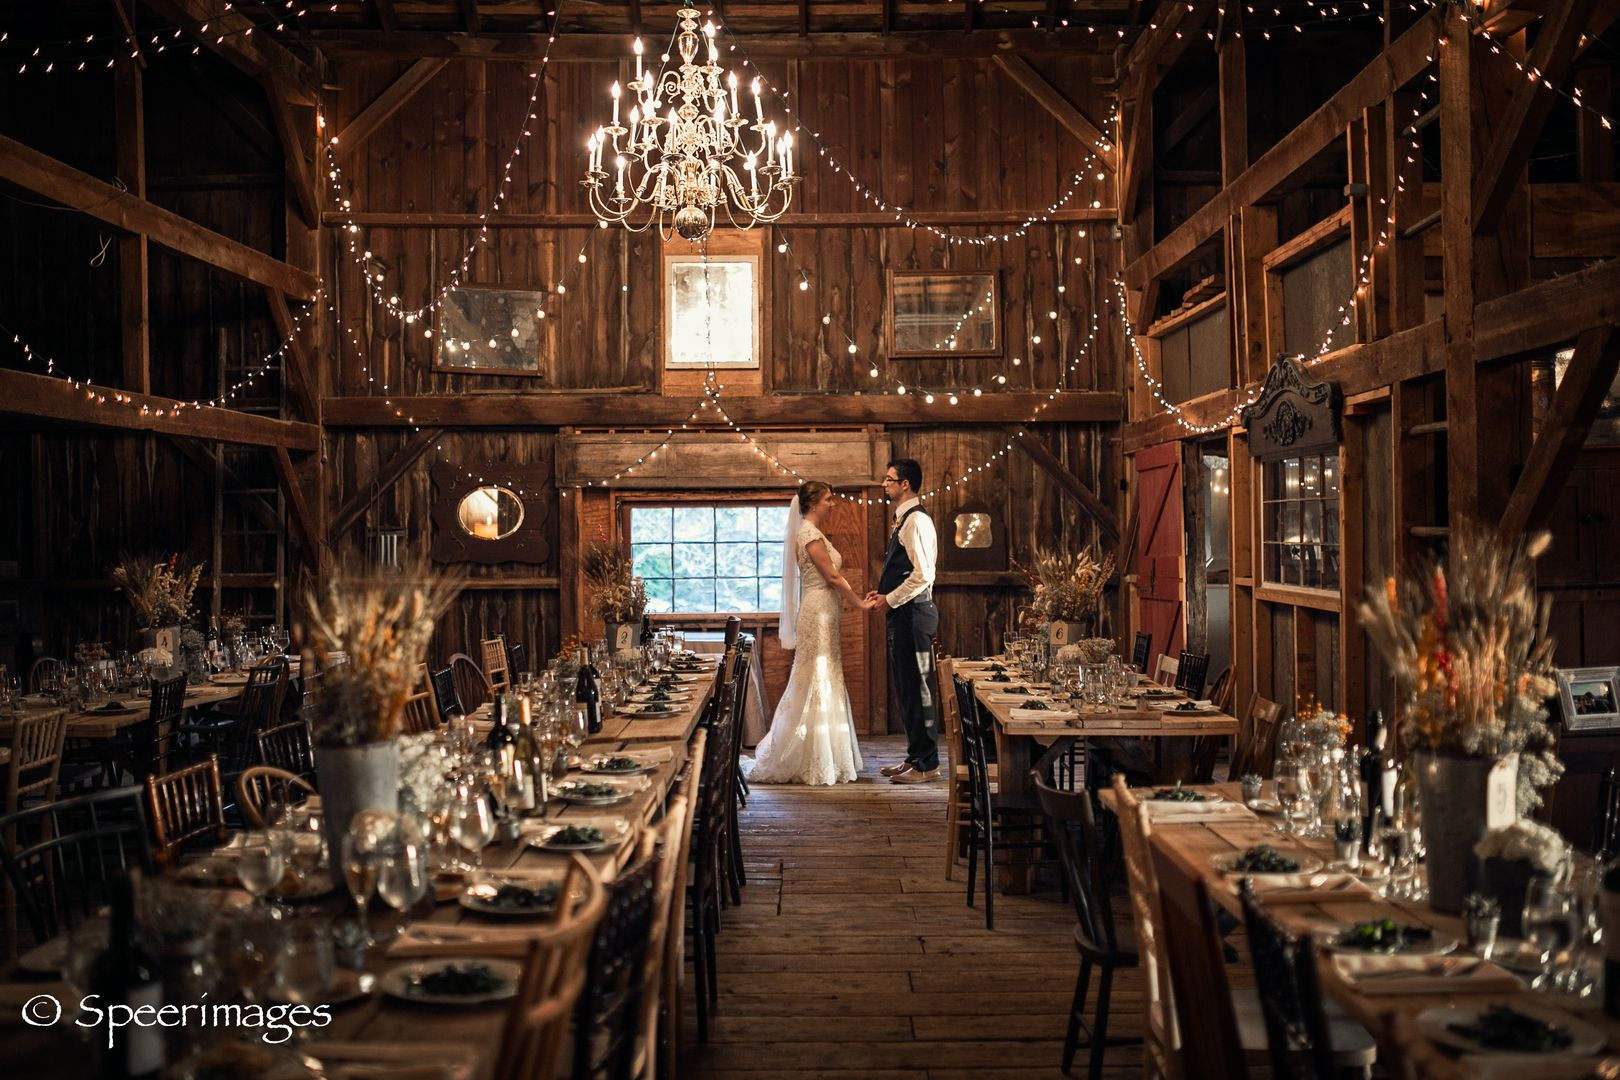 Local Wedding Venues Near Me: The Loft At Jack's Barn